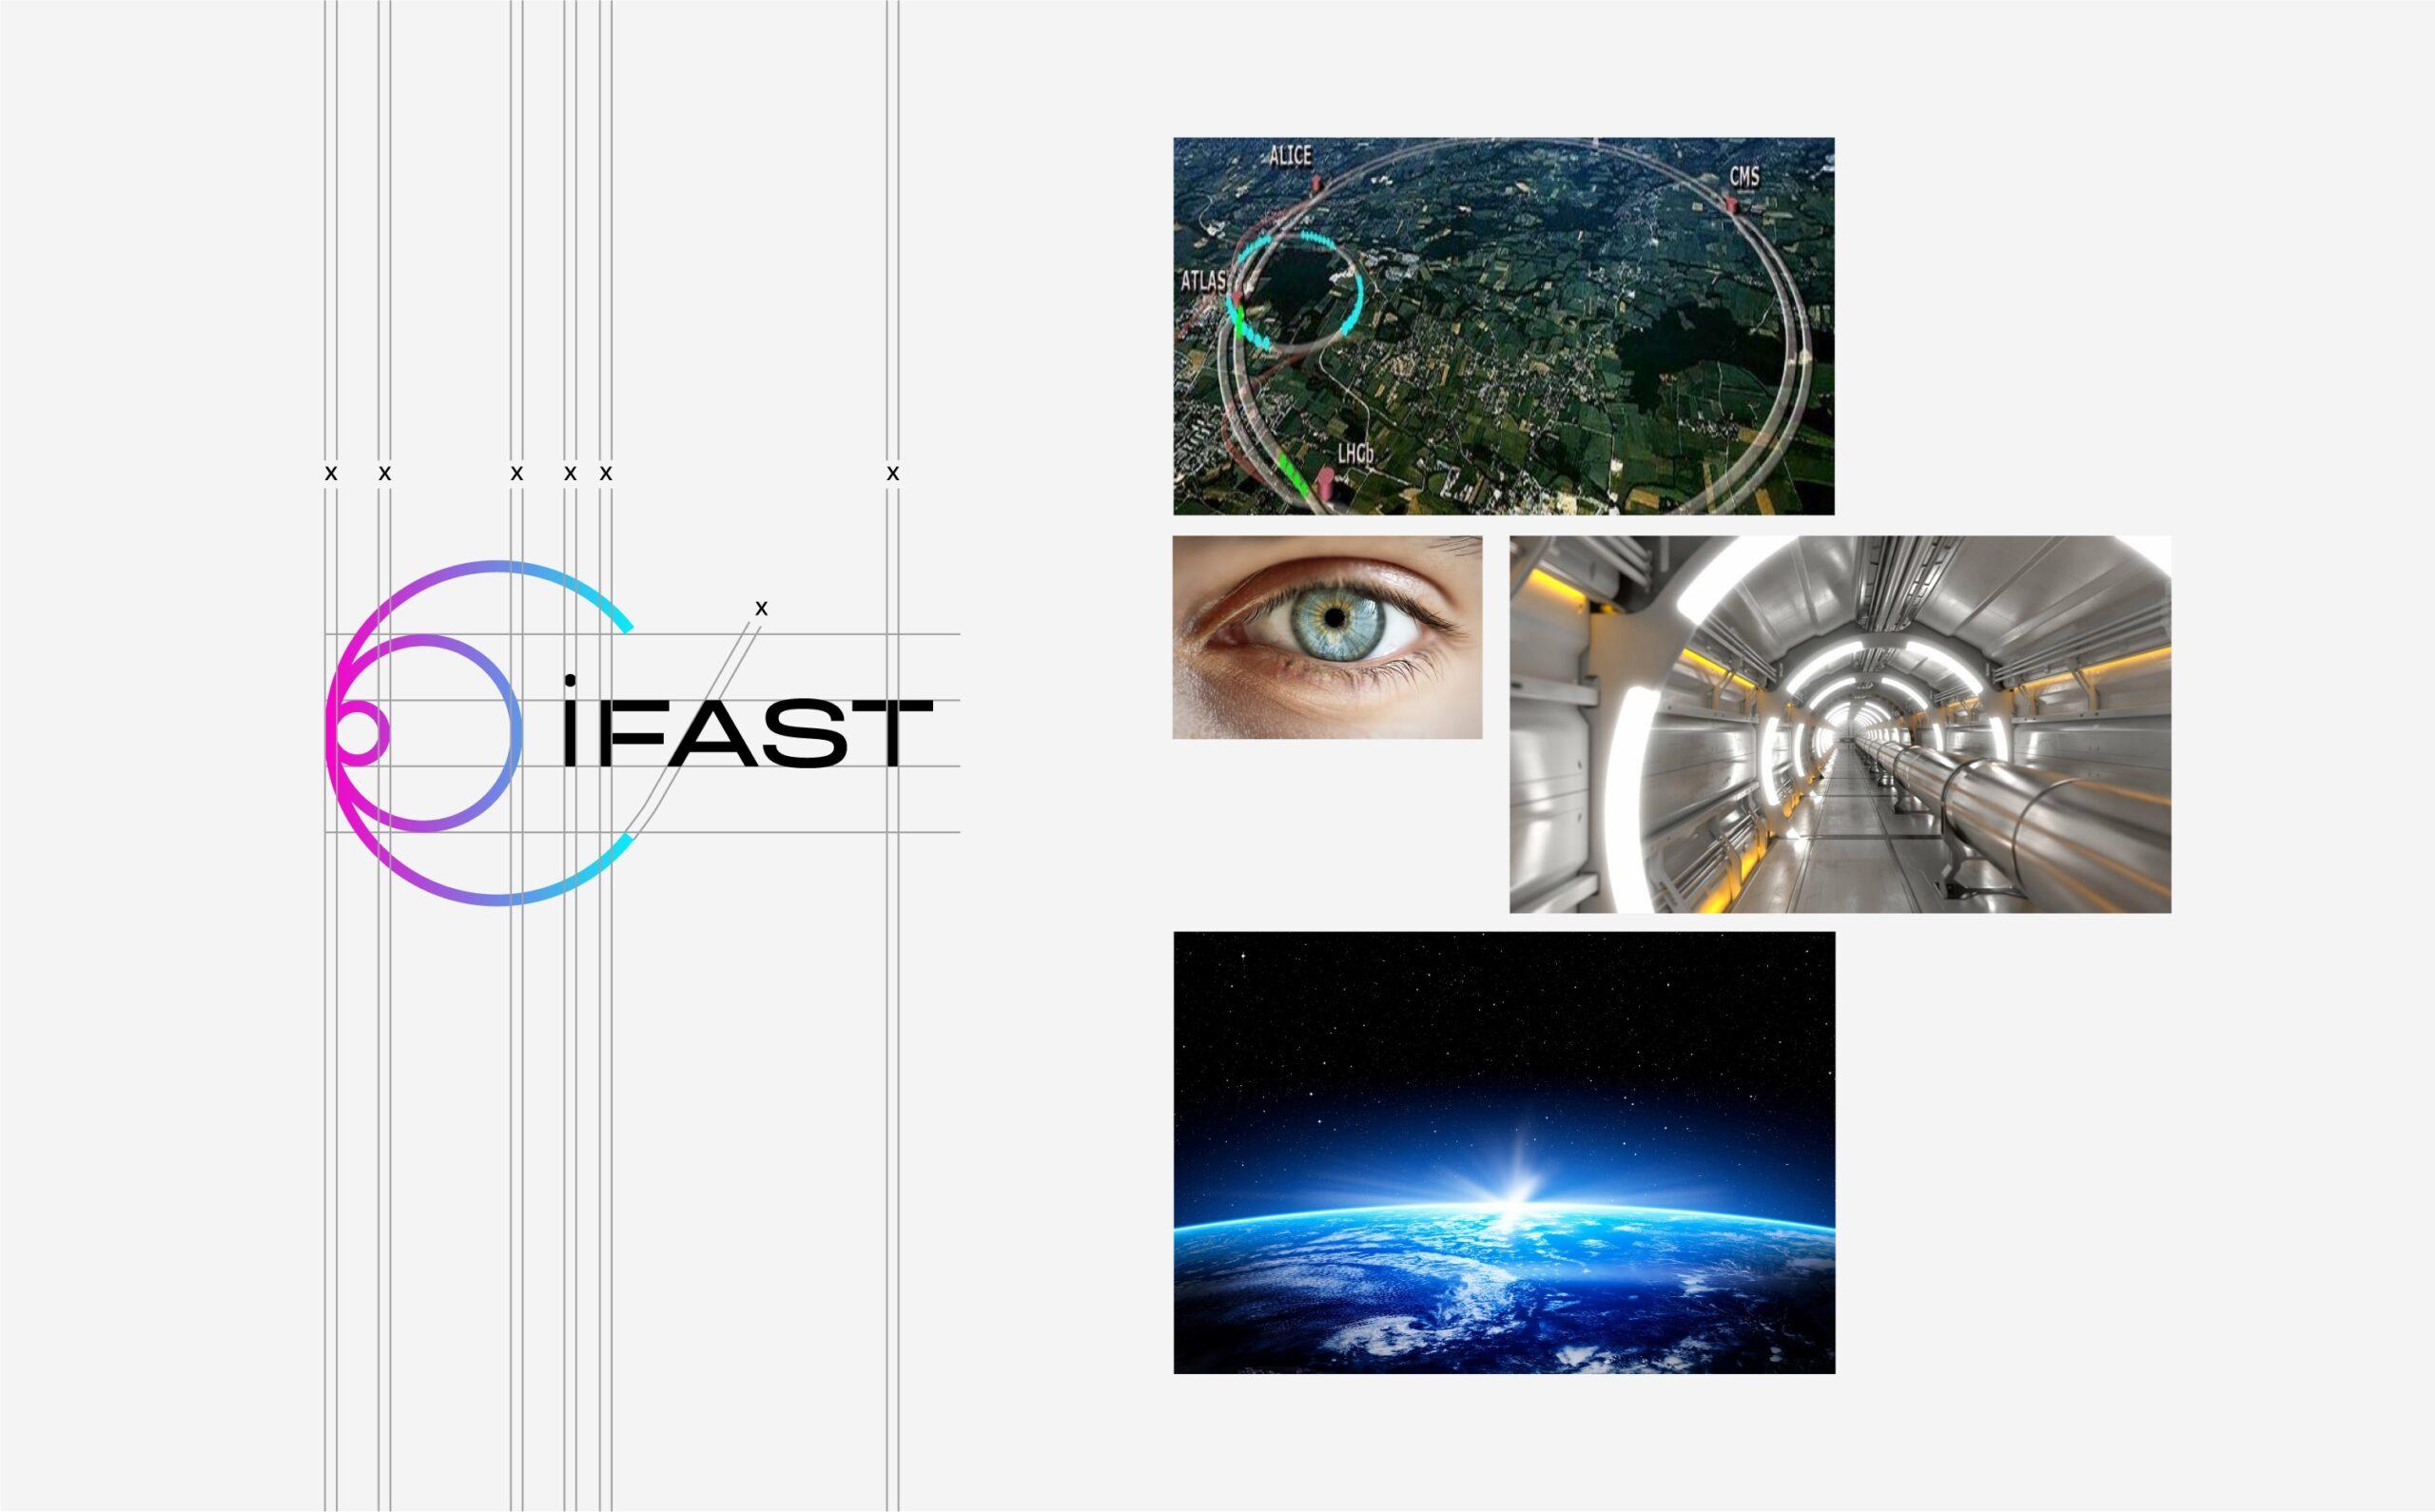 CERN_iFAST_logo_pamatojums